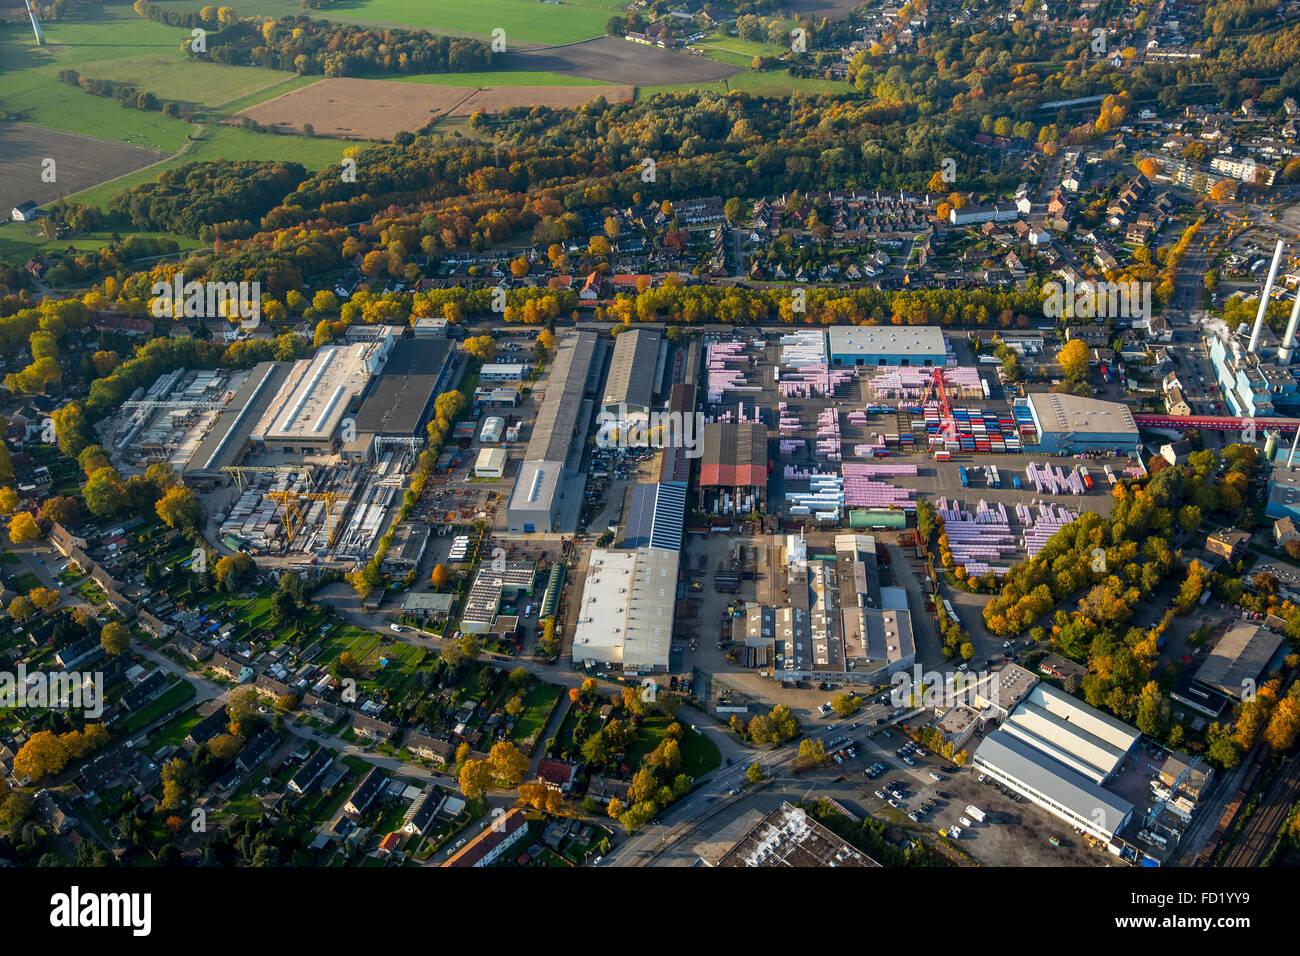 Rockwool, mineral wool, Gladbeck, Ruhr district, North Rhine-Westphalia, Germany - Stock Image